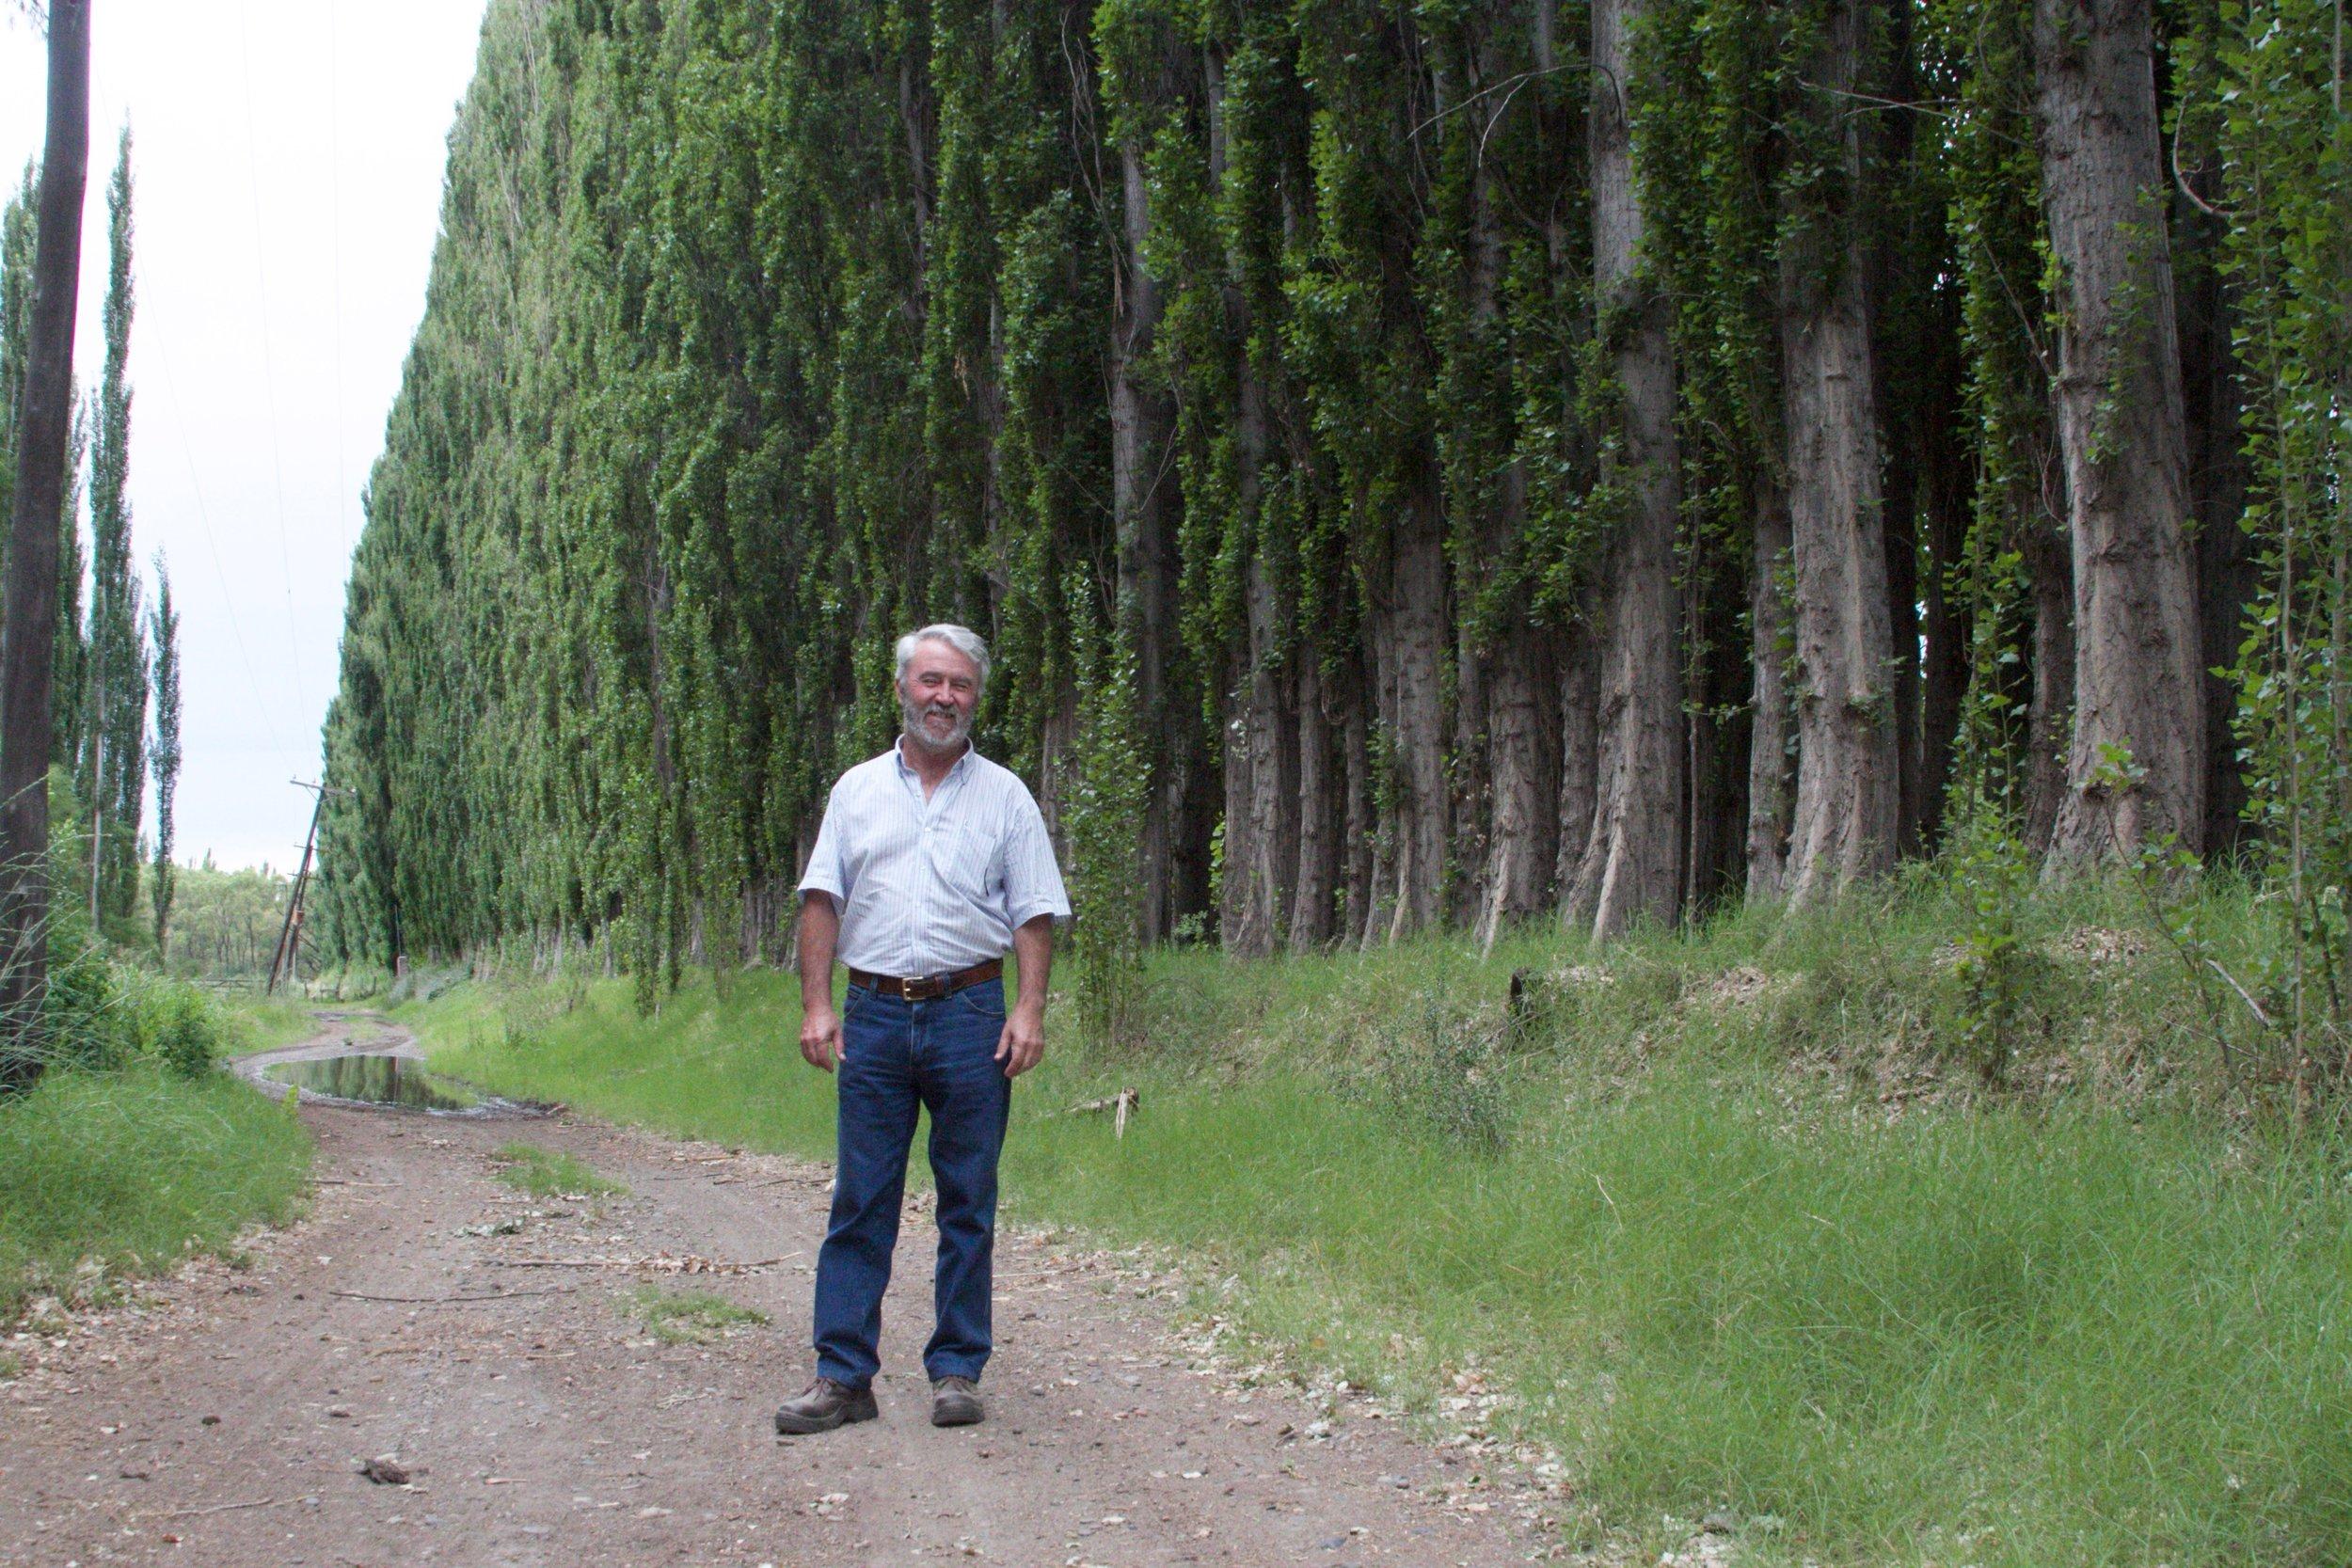 Julio Garcia, state forester, and a colossal poplar windbreak.